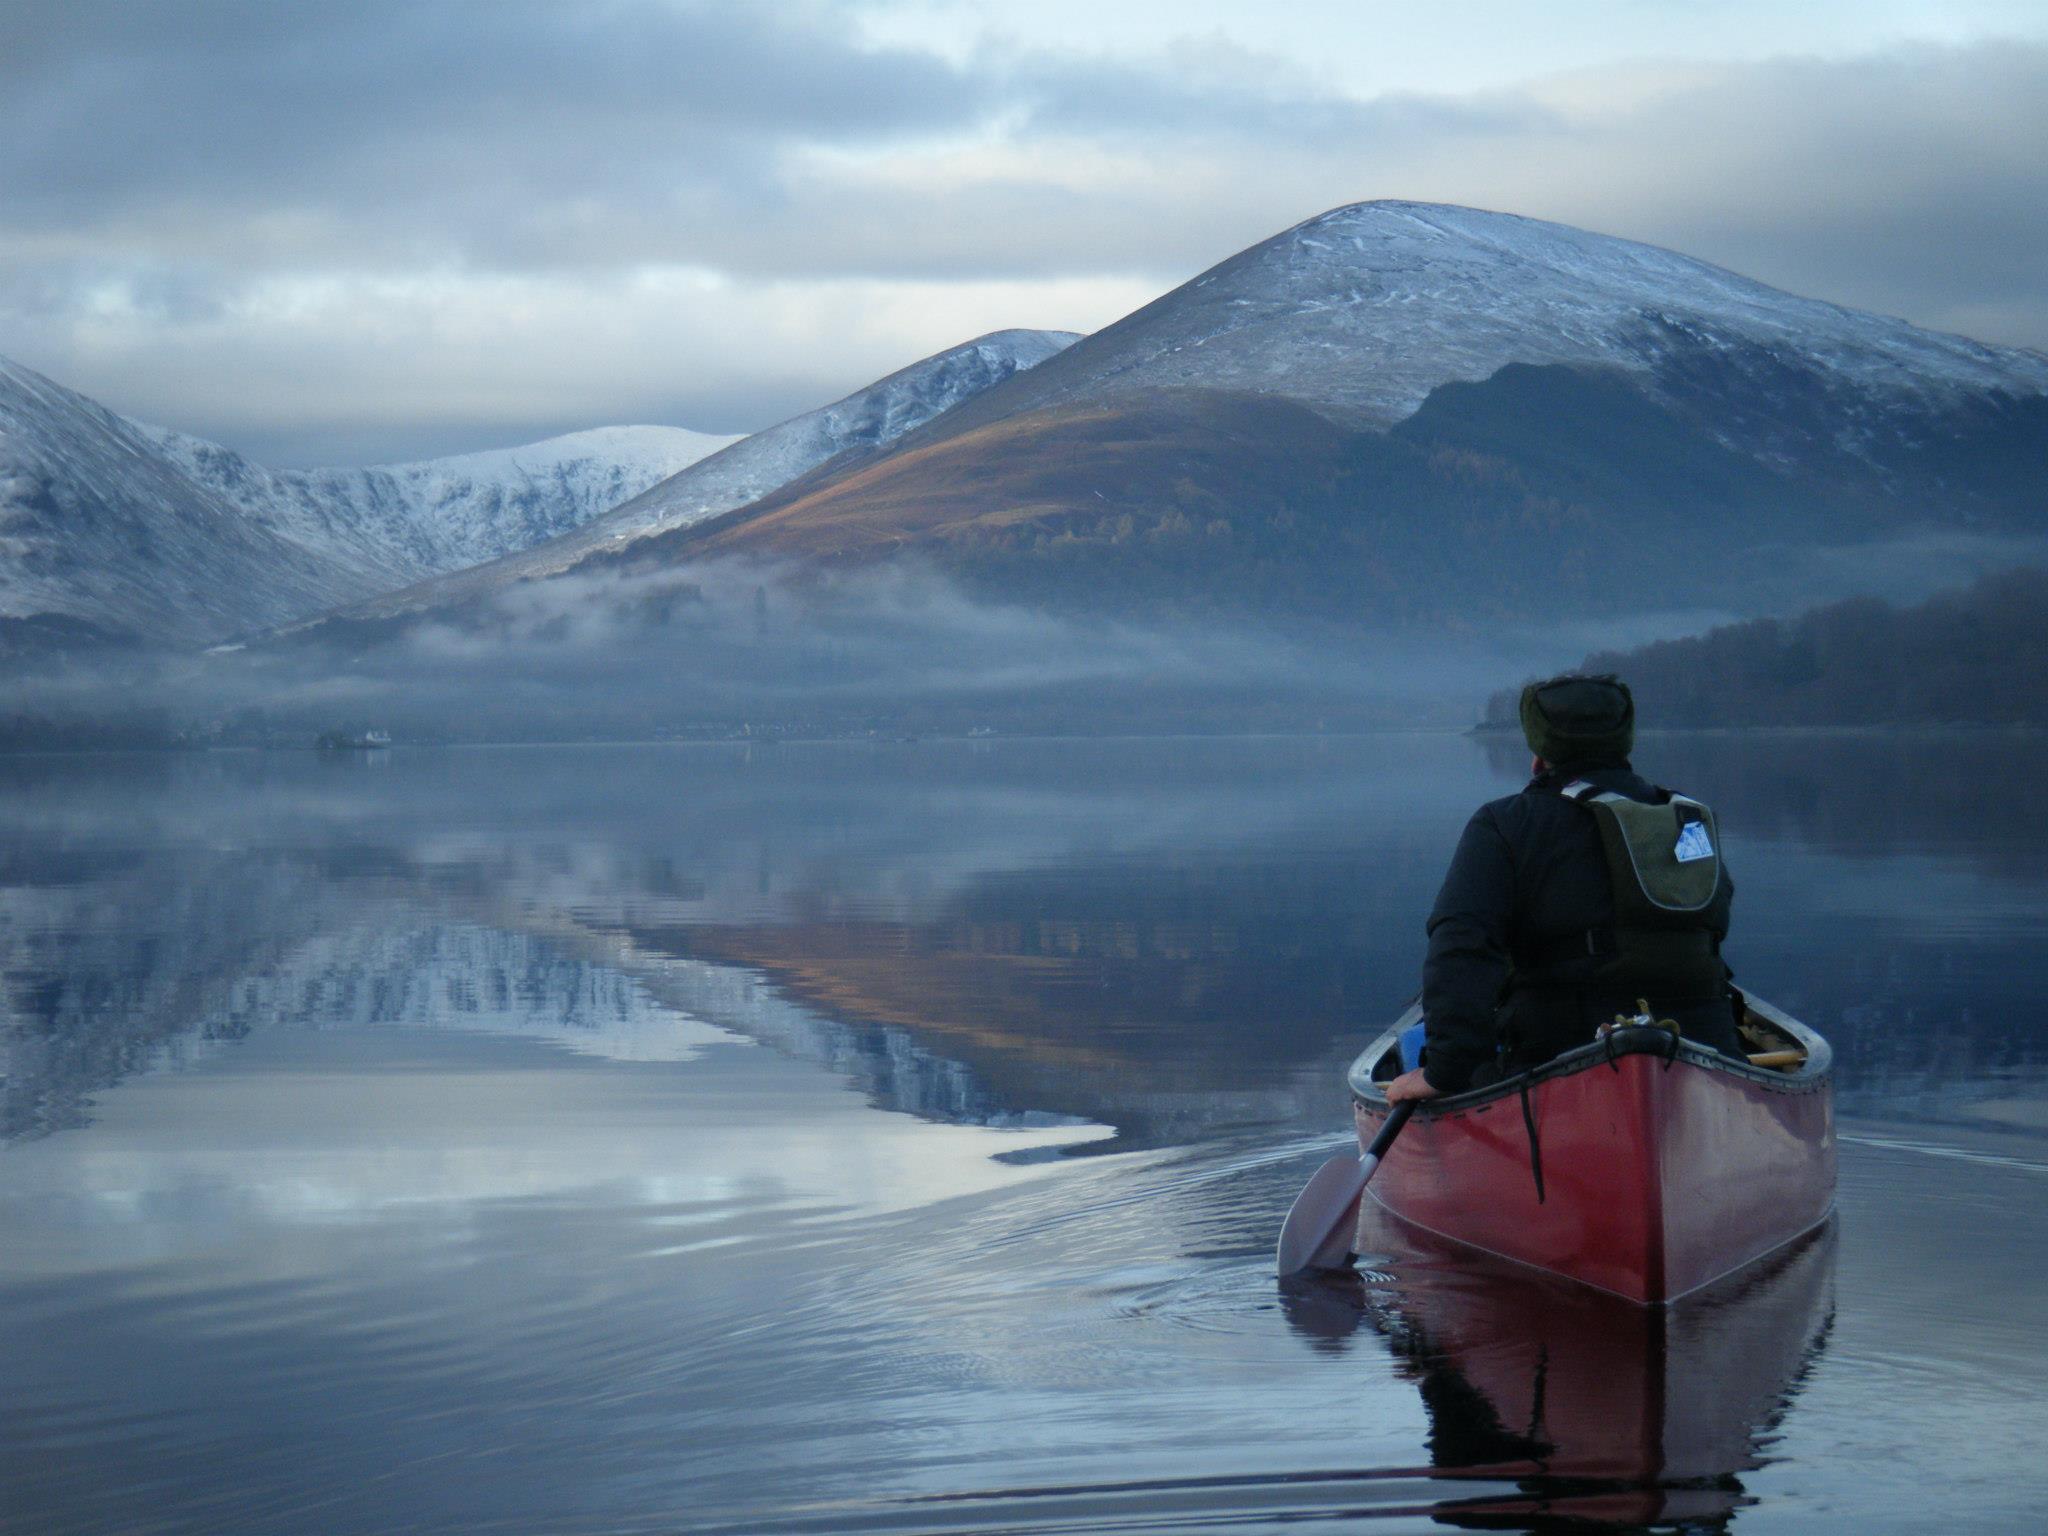 Scotland by canoe - so peaceful!